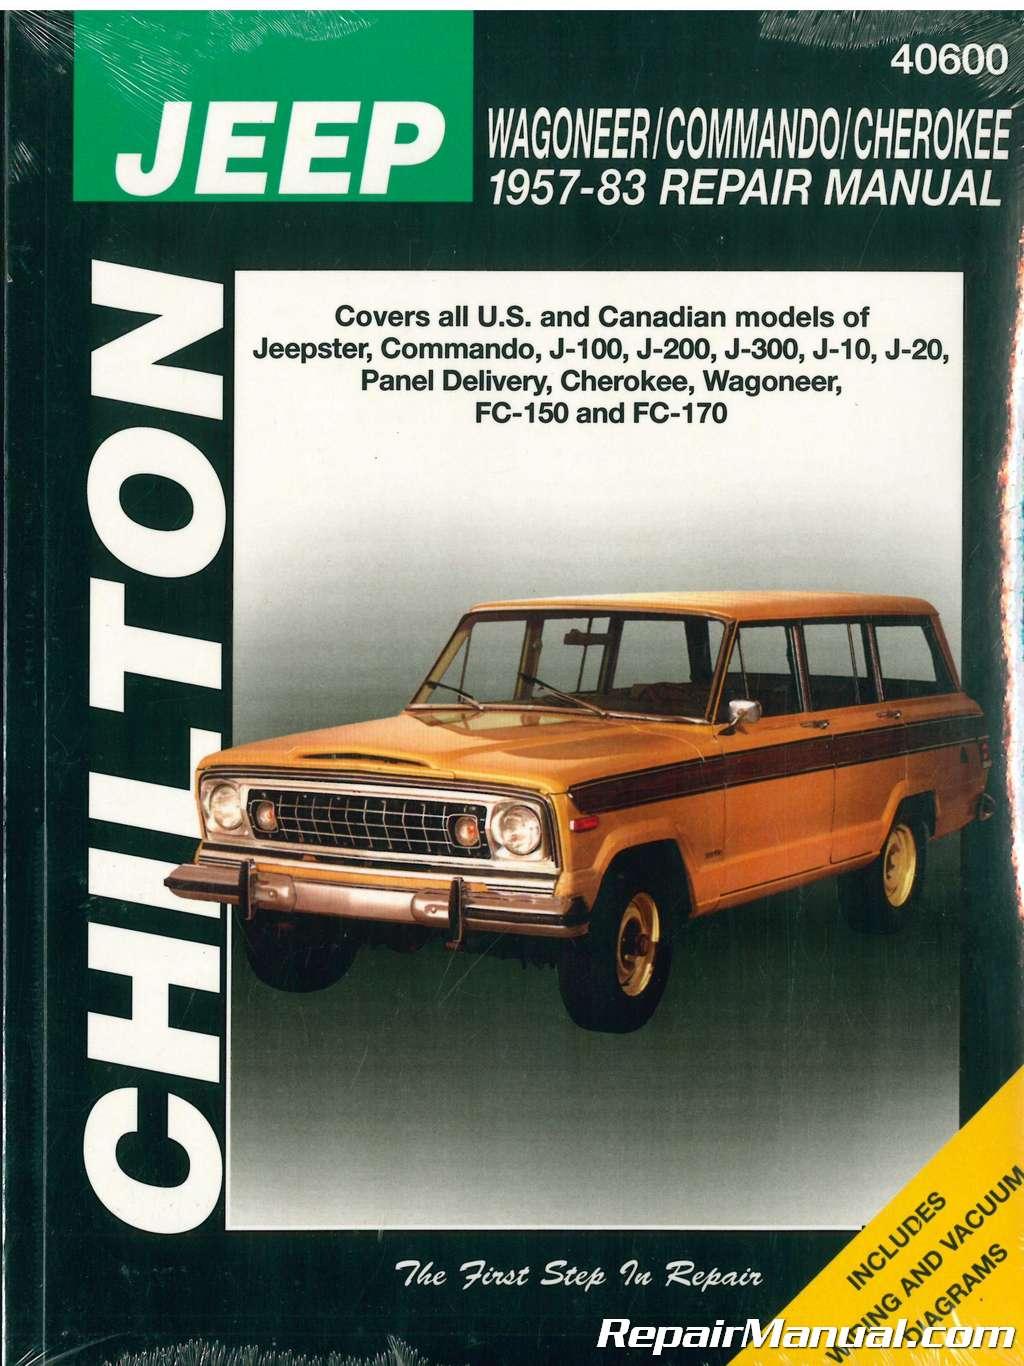 jeep wagoneer commando cherokee 1957 1983 chilton repair manual rh repairmanual com Jeep Wrangler Repair Manual Chilton Jeep CJ Rebuilders Manual